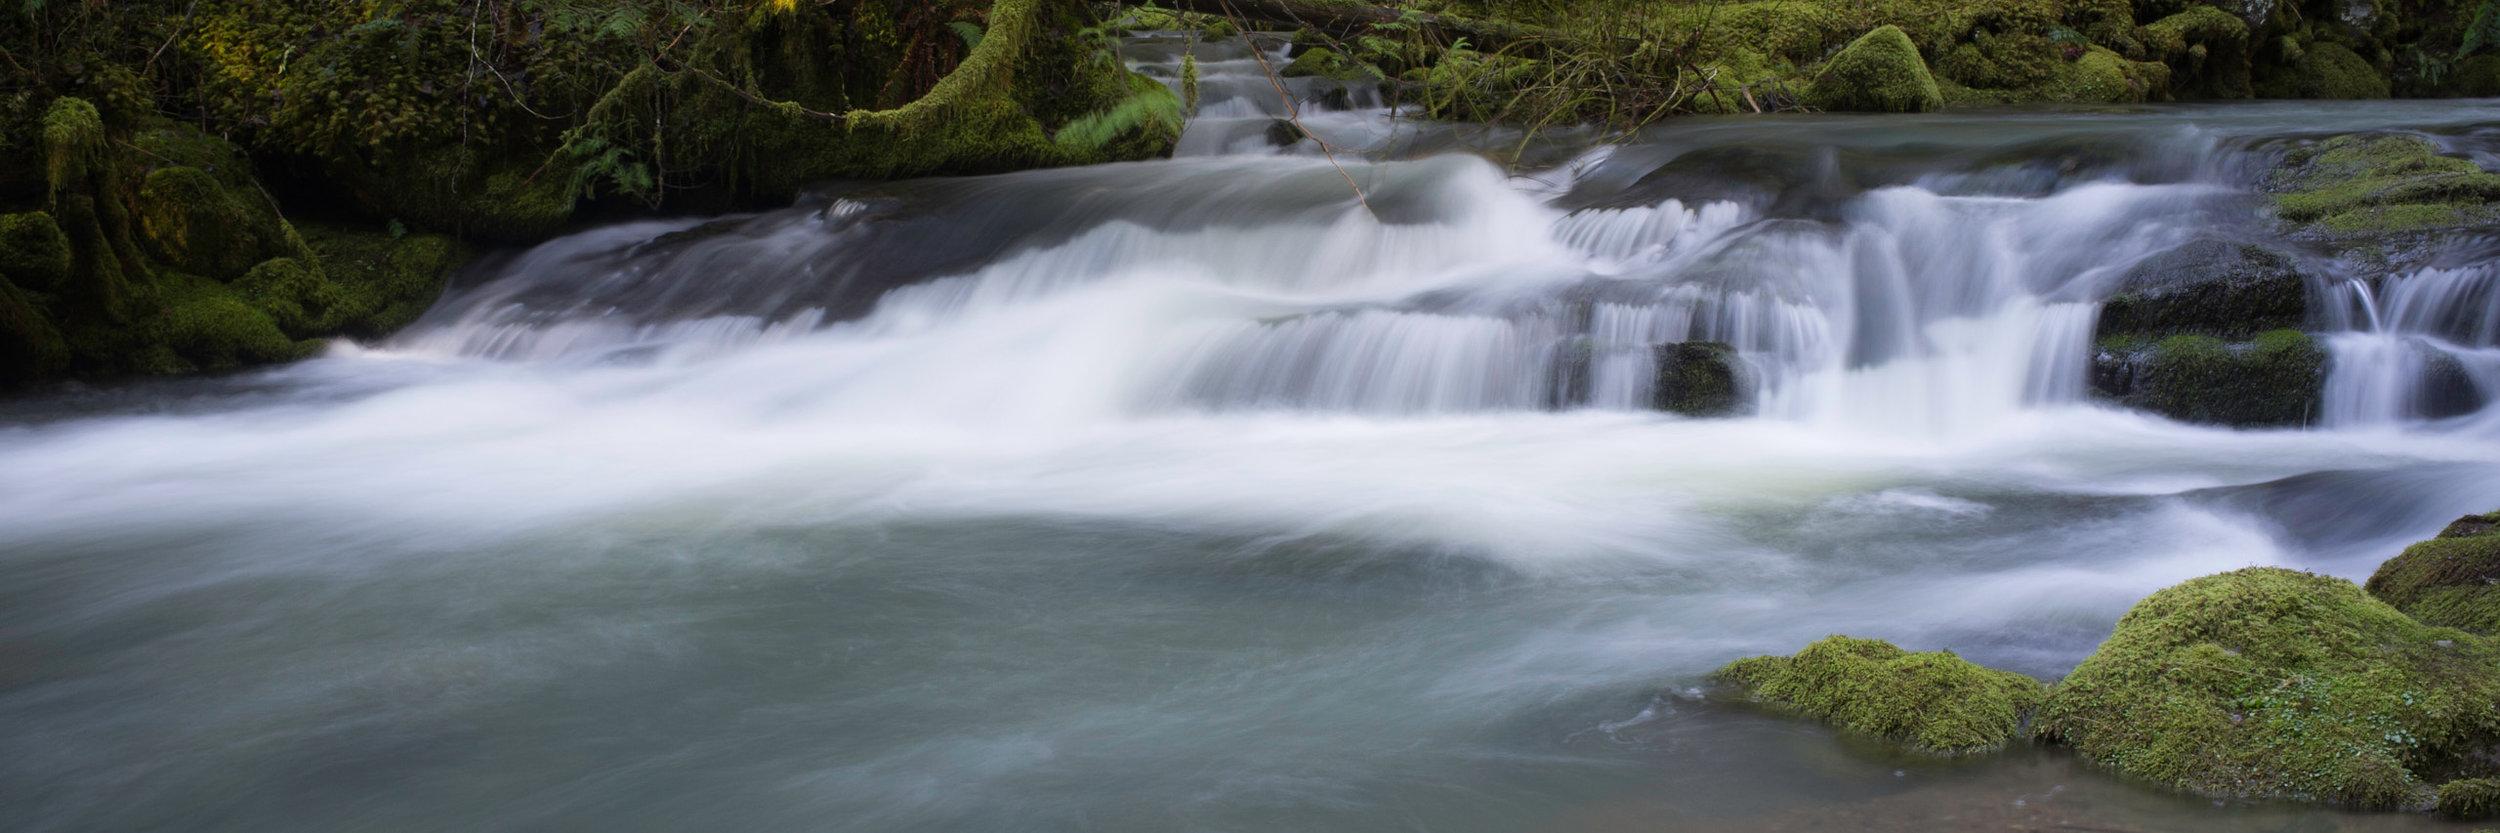 Larison Creek_2014 - -60-20140222_Larison_Creek_Oregon_0006.jpg